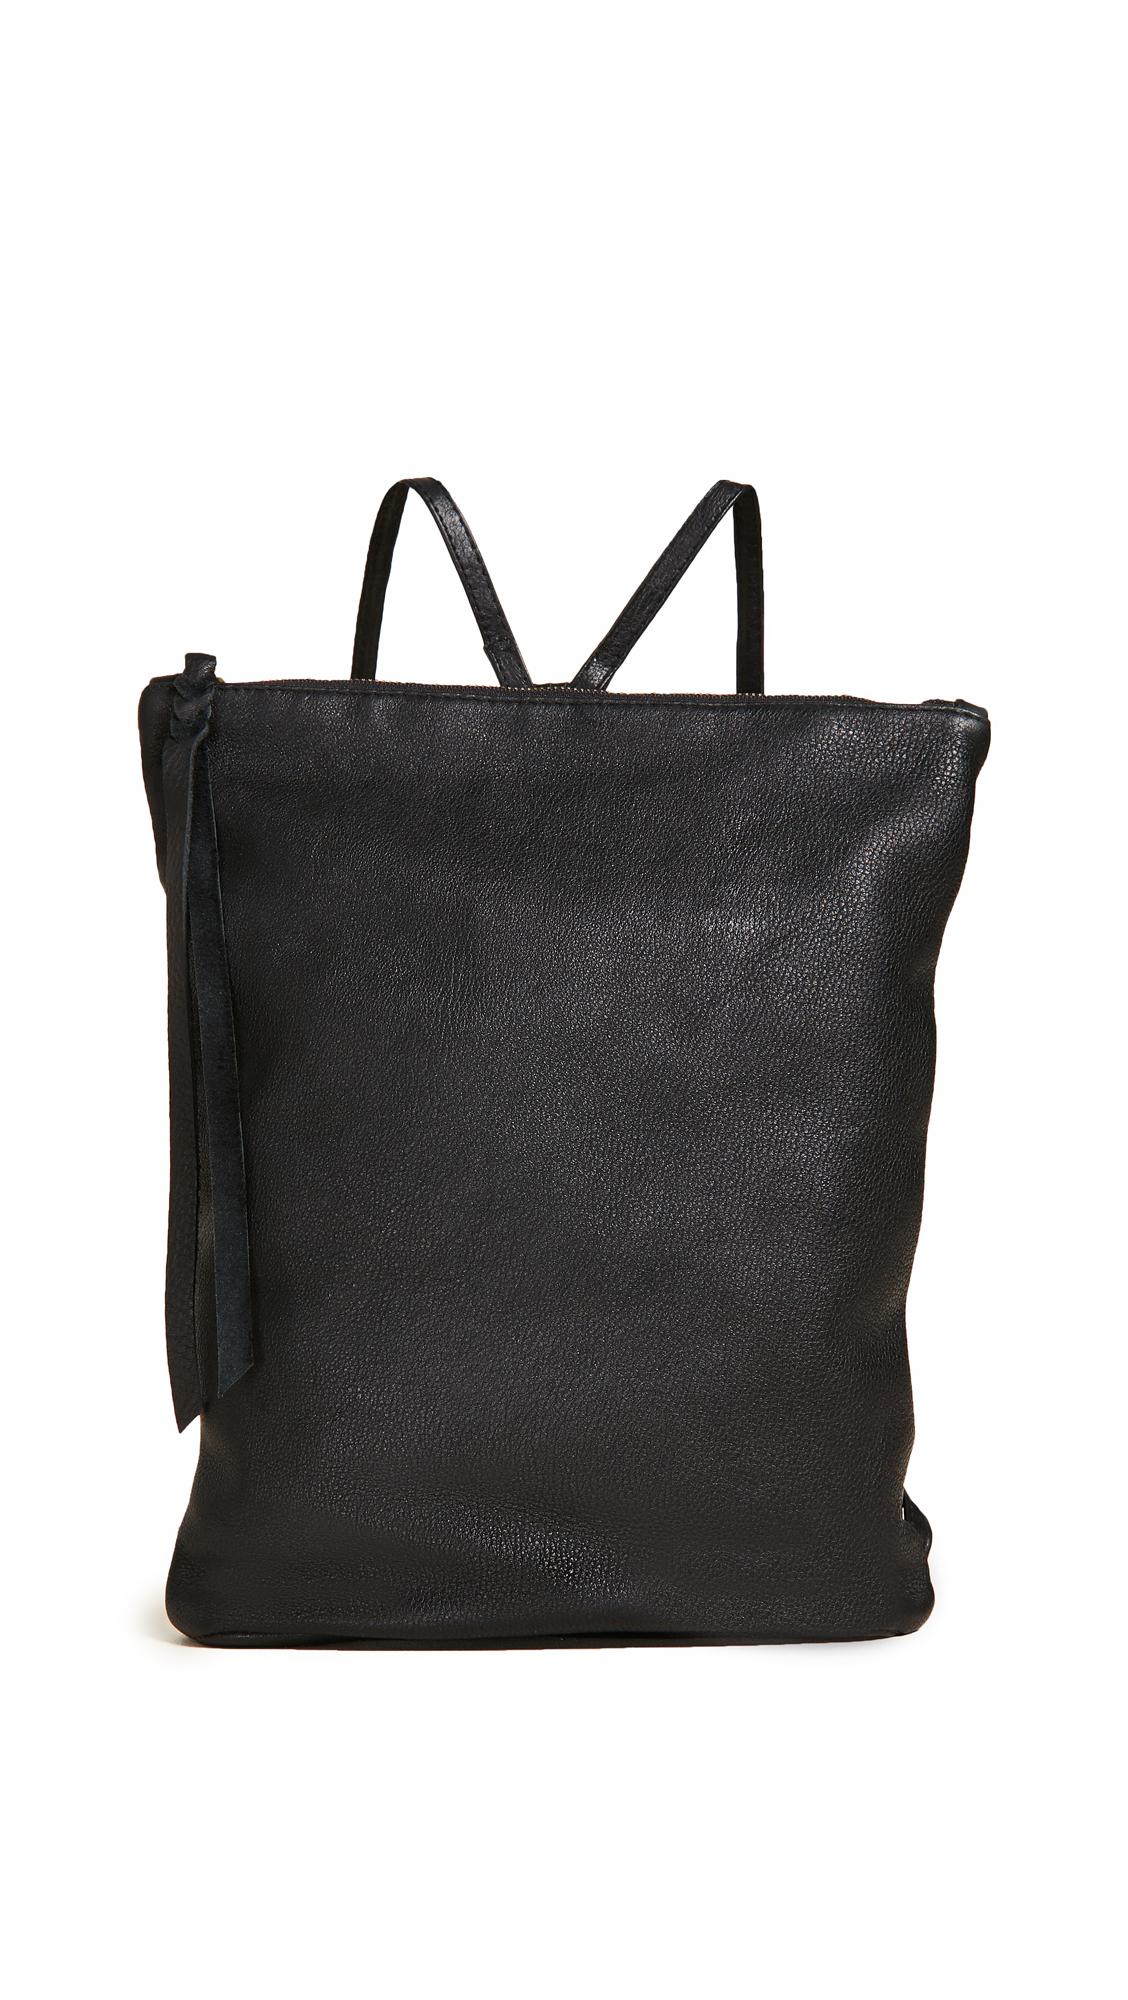 Cleobella Babylon Backpack - Black